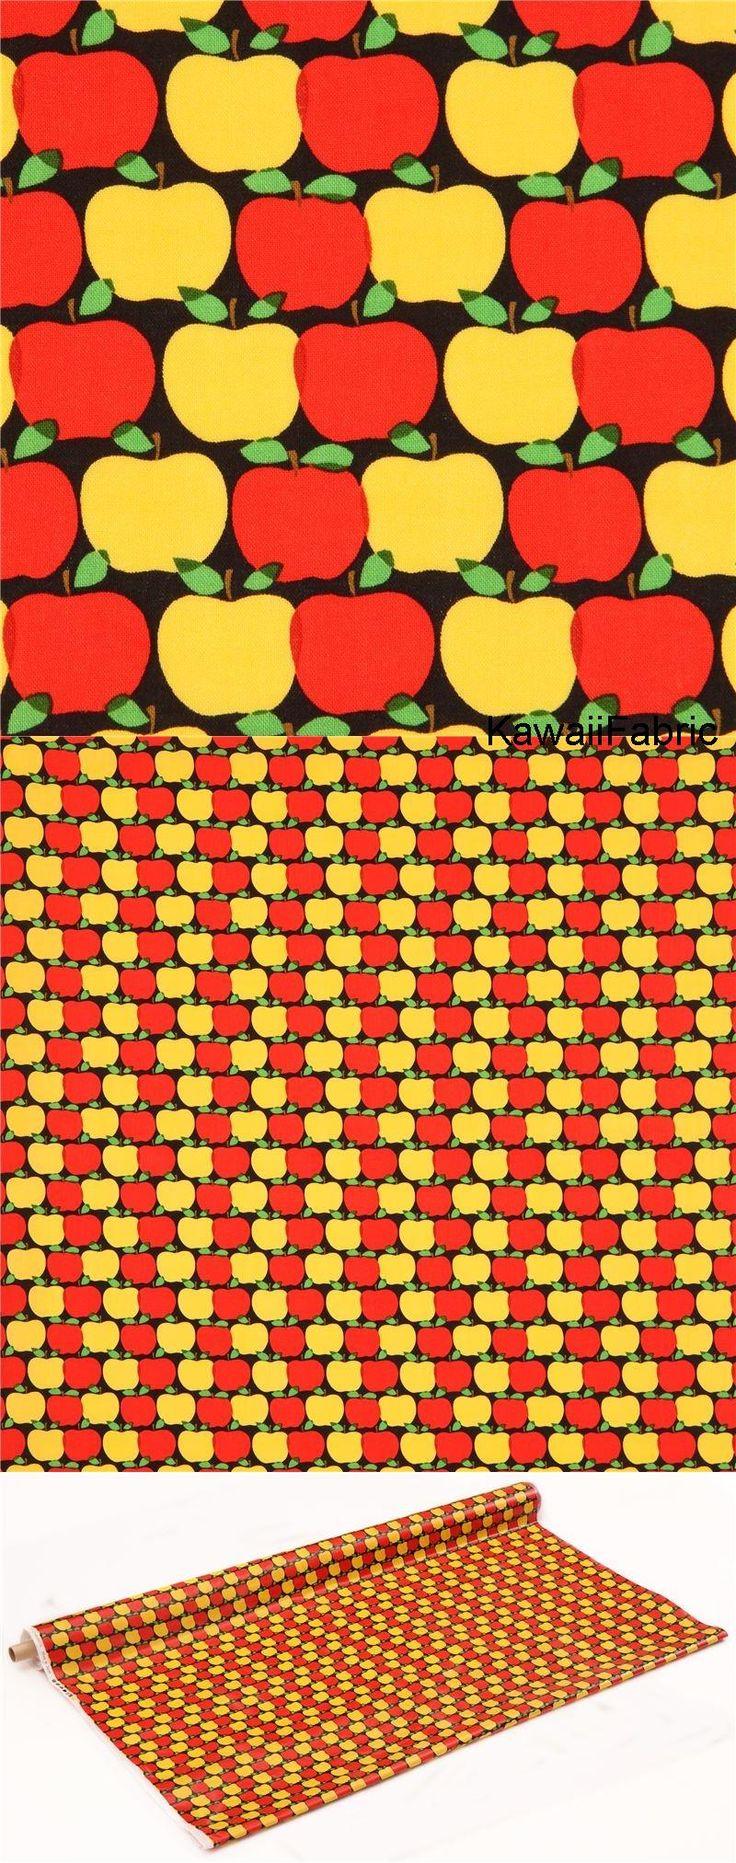 62 Best Tessuti Images On Pinterest | Fabric Shop, Japanese Fabric